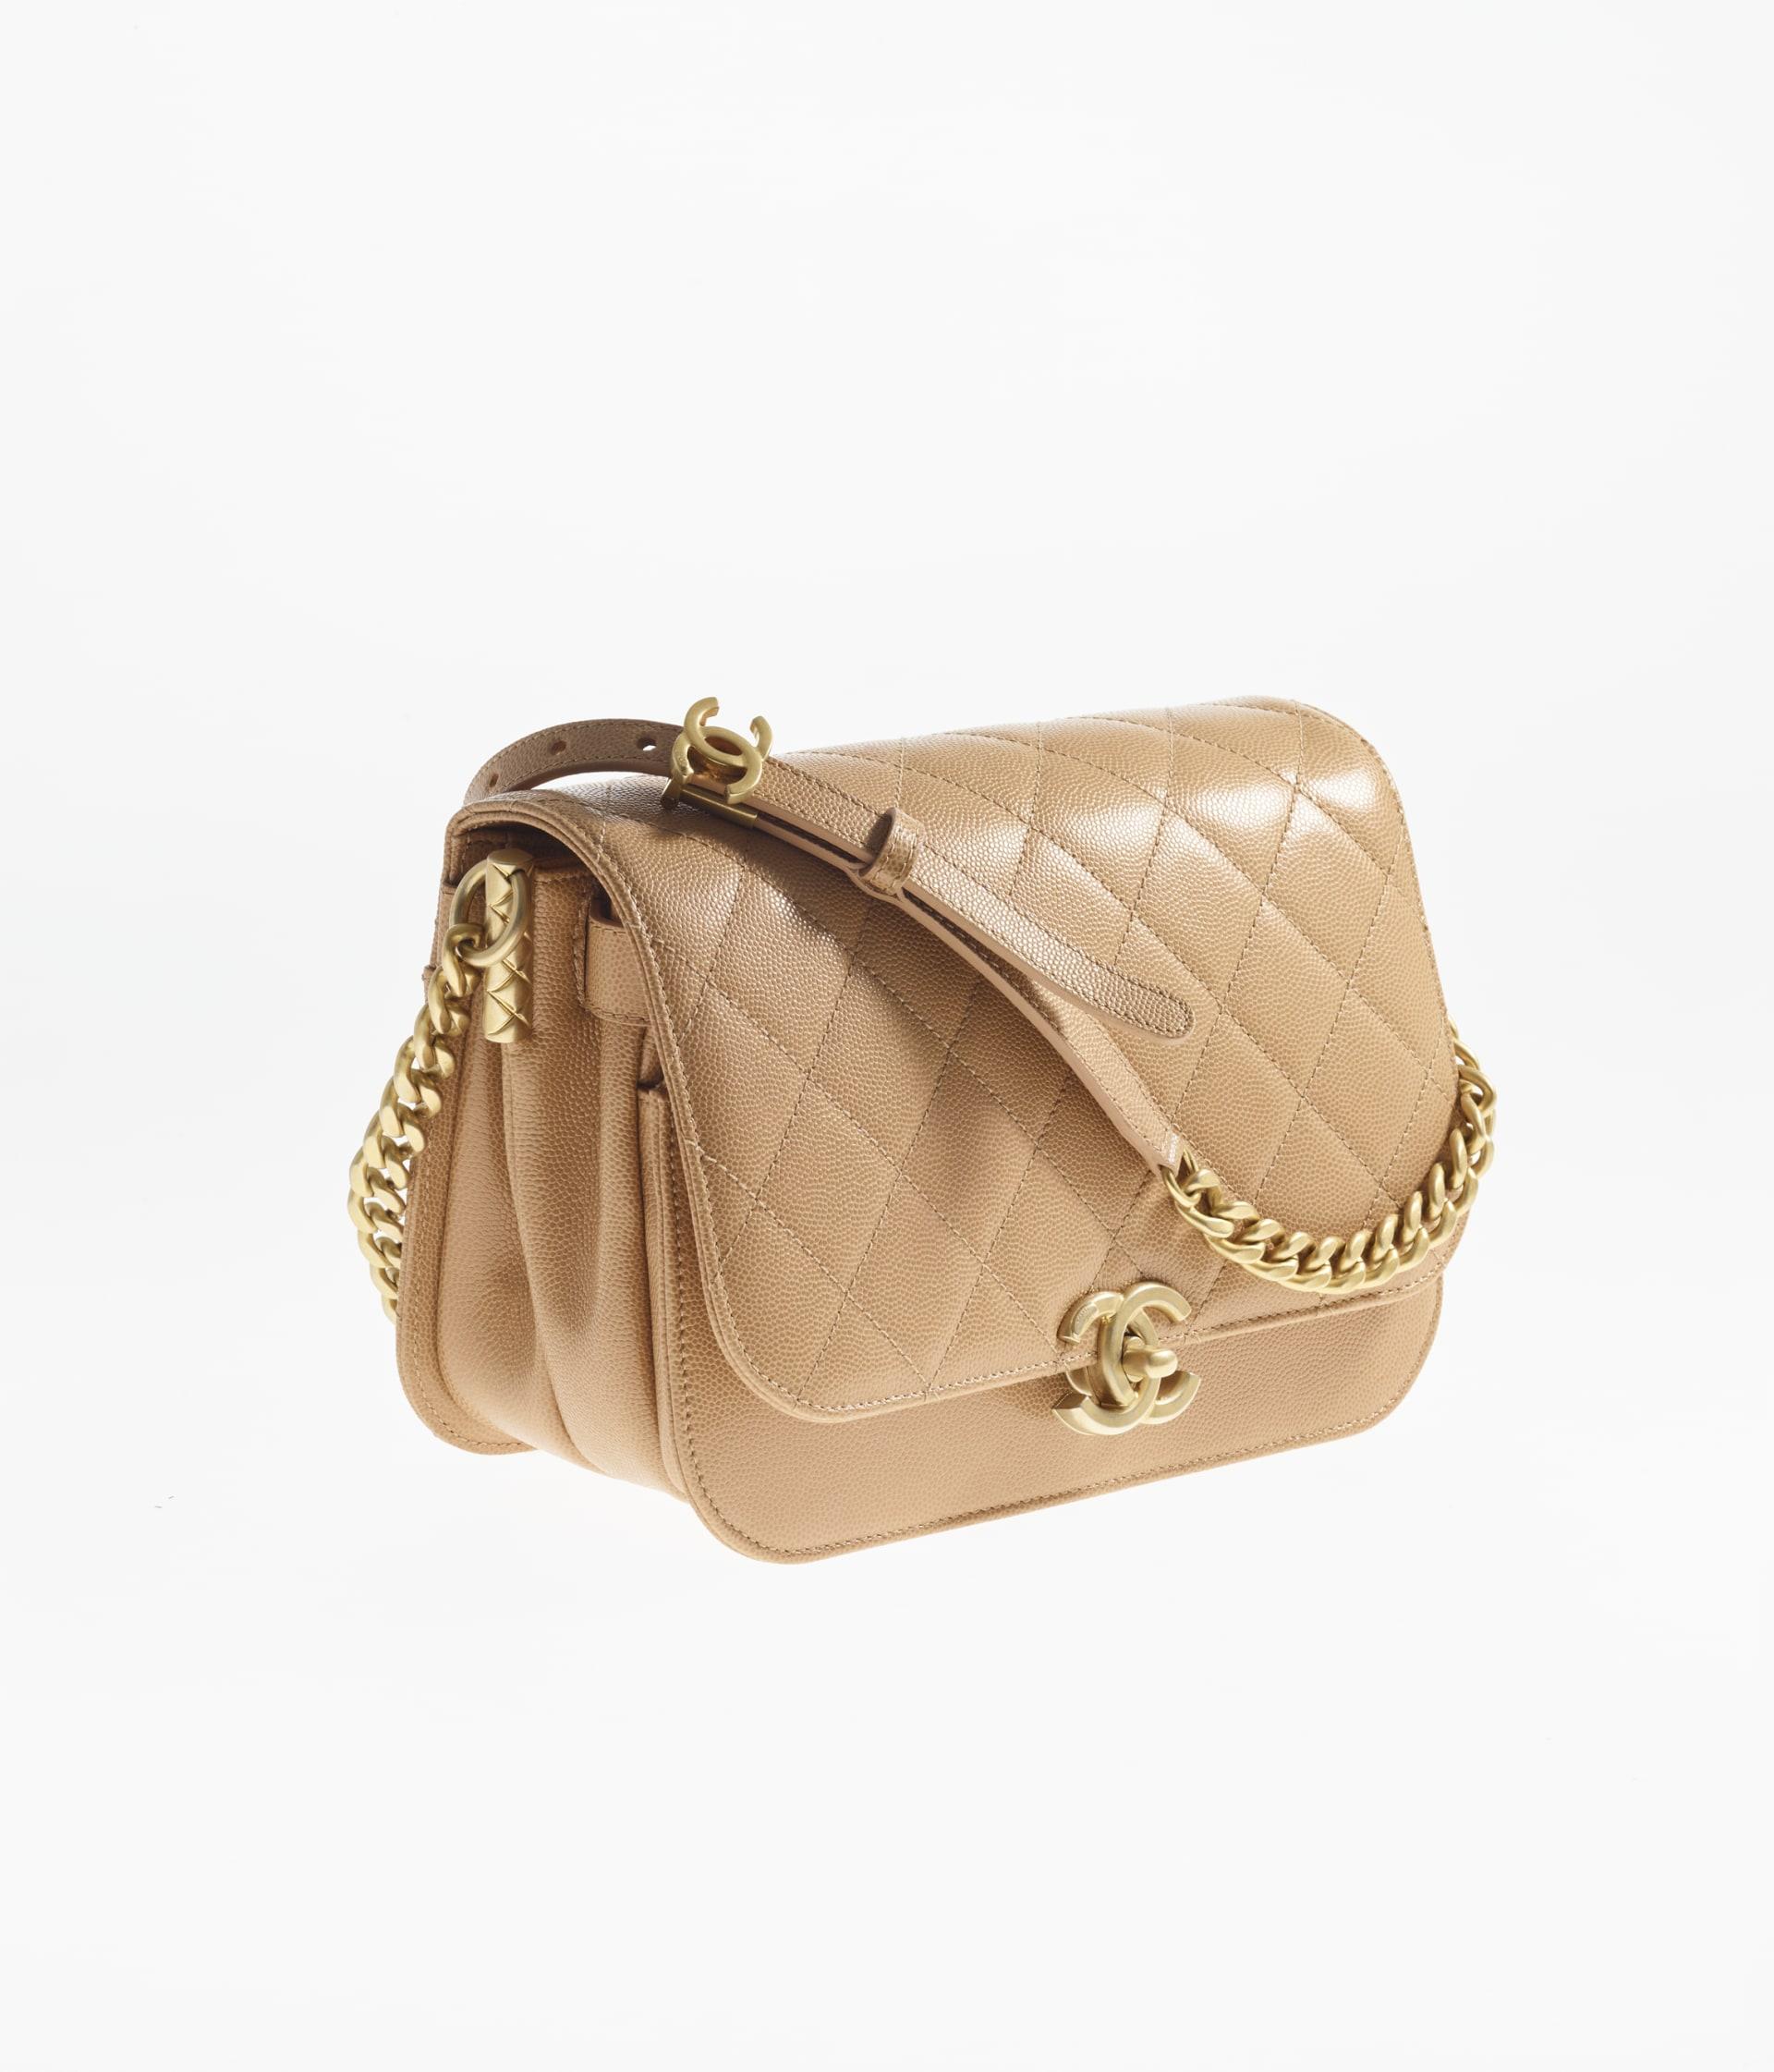 image 2 - Small Messenger Bag - Grained Calfskin & Gold-Tone Metal - Beige